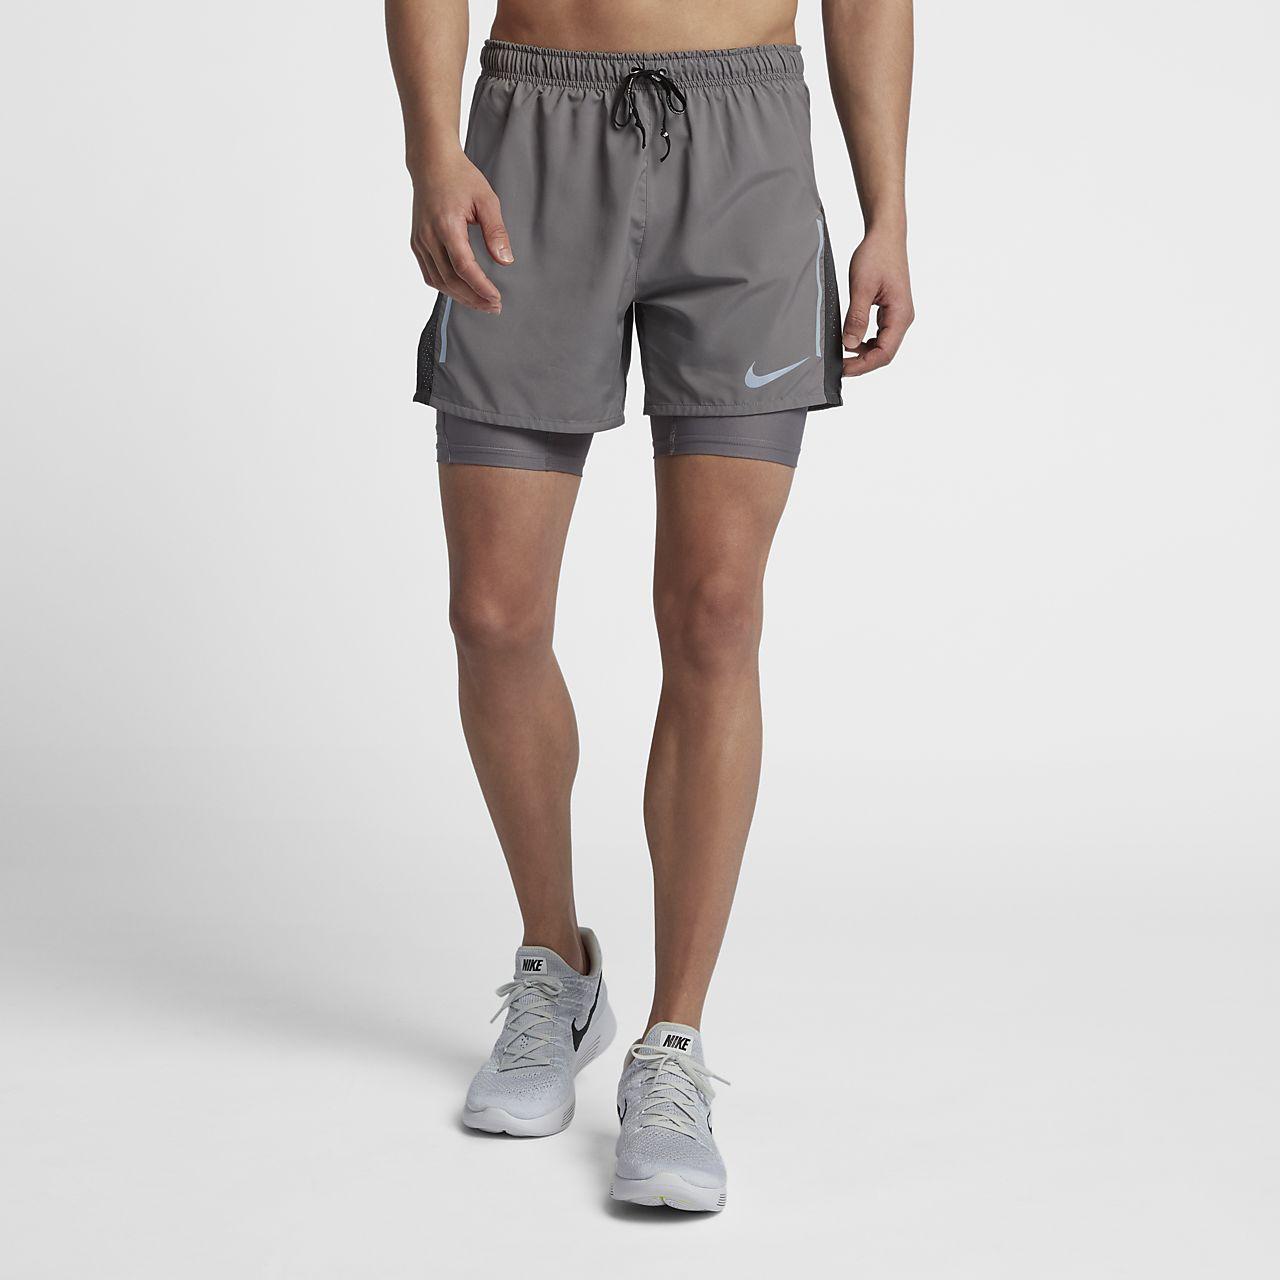 ... Nike Distance Men's 2-in-1 Running Shorts